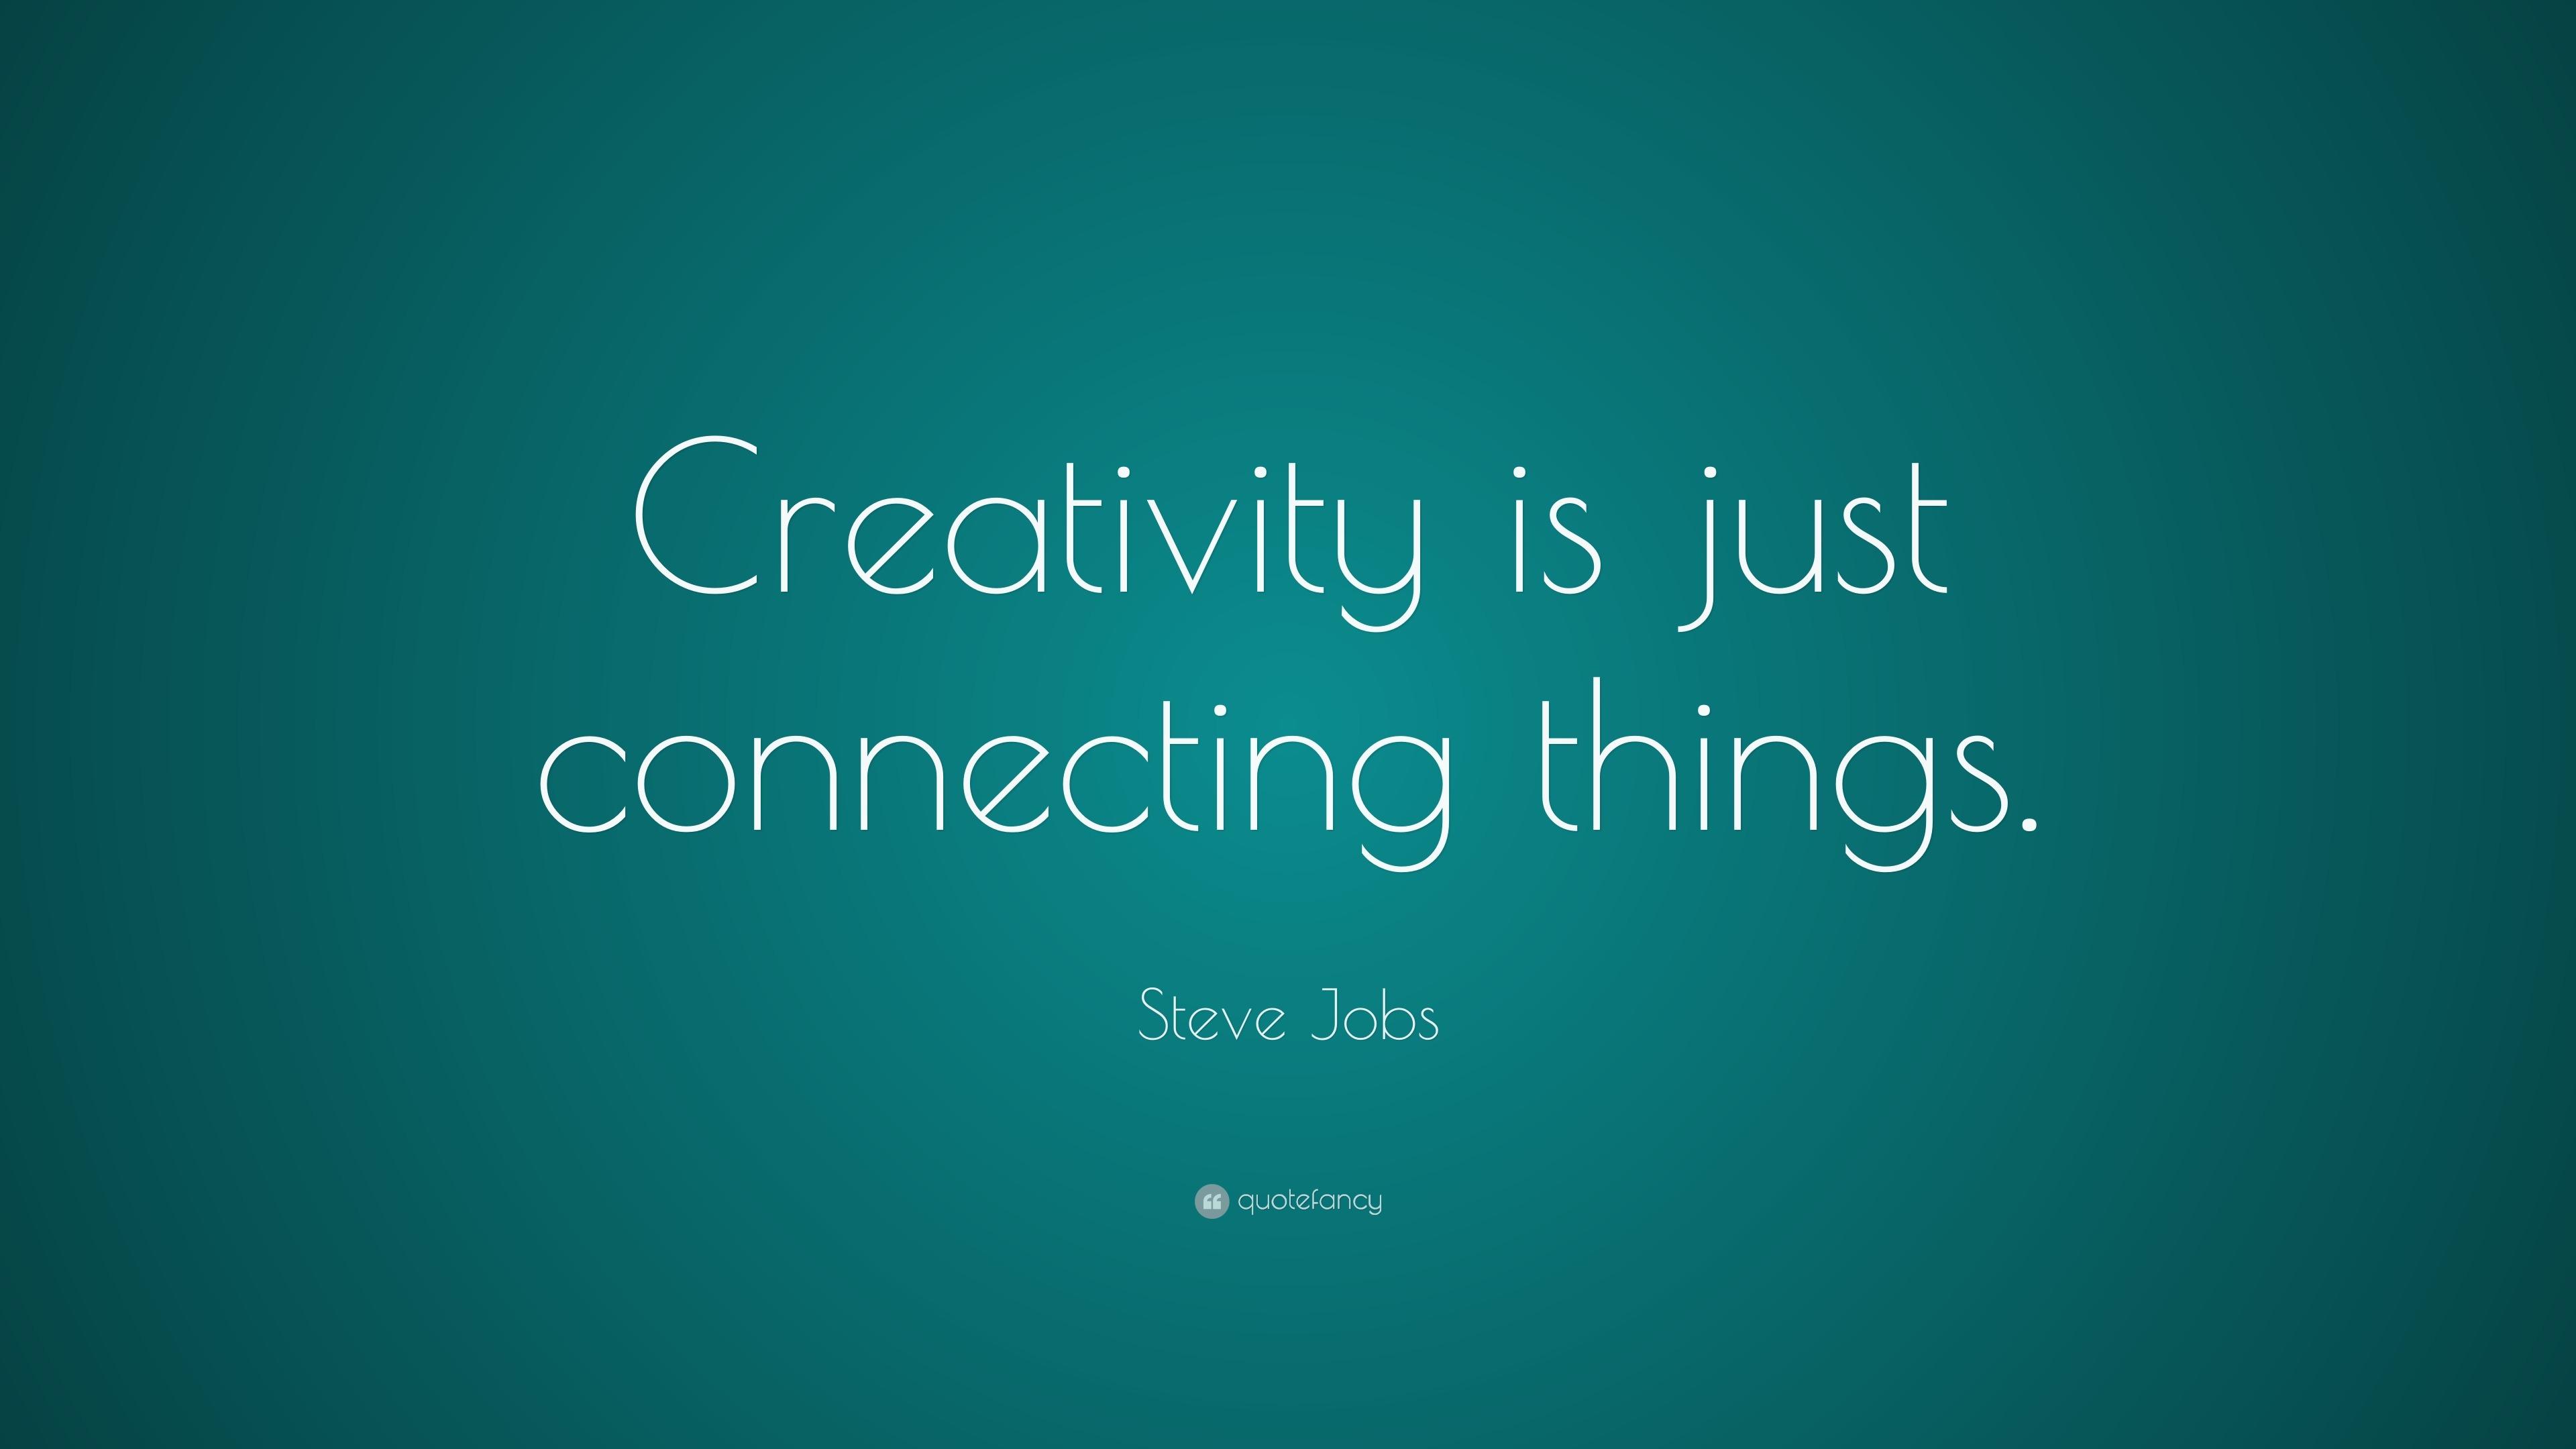 Iphone 6 Wallpaper Steve Jobs Quote Creativity Quotes 57 Wallpapers Quotefancy